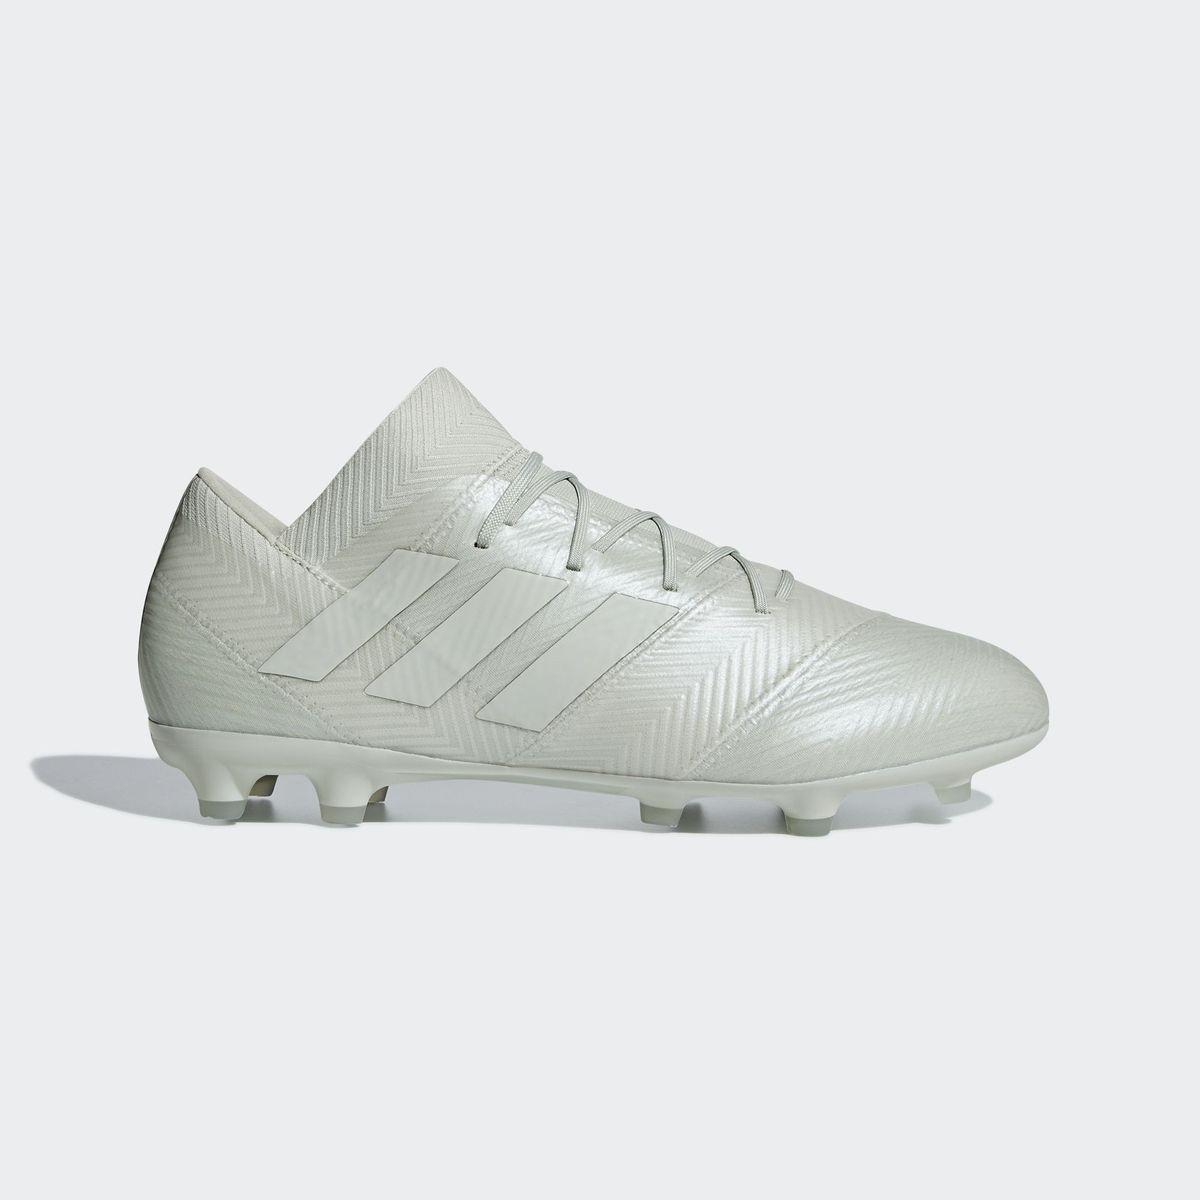 chaussures de football puma 2016 euro enfant